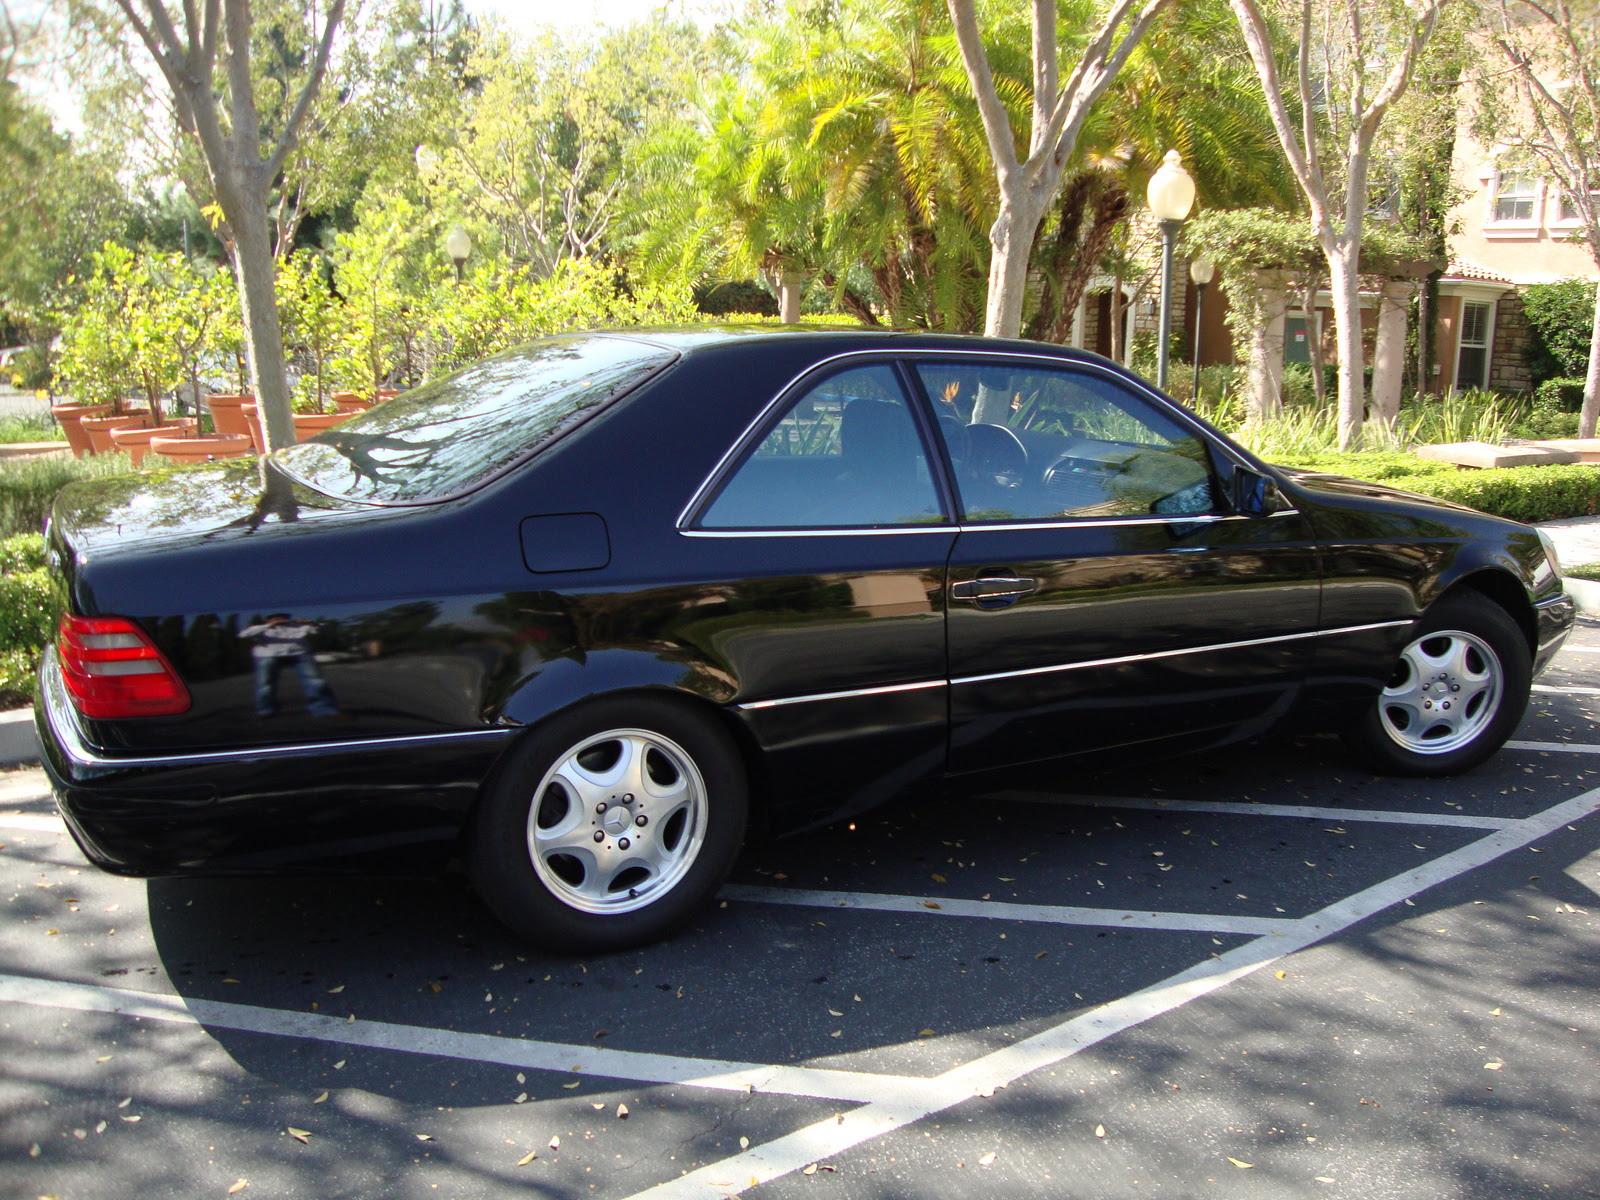 1997 Mercedes-Benz S-Class - Pictures - CarGurus